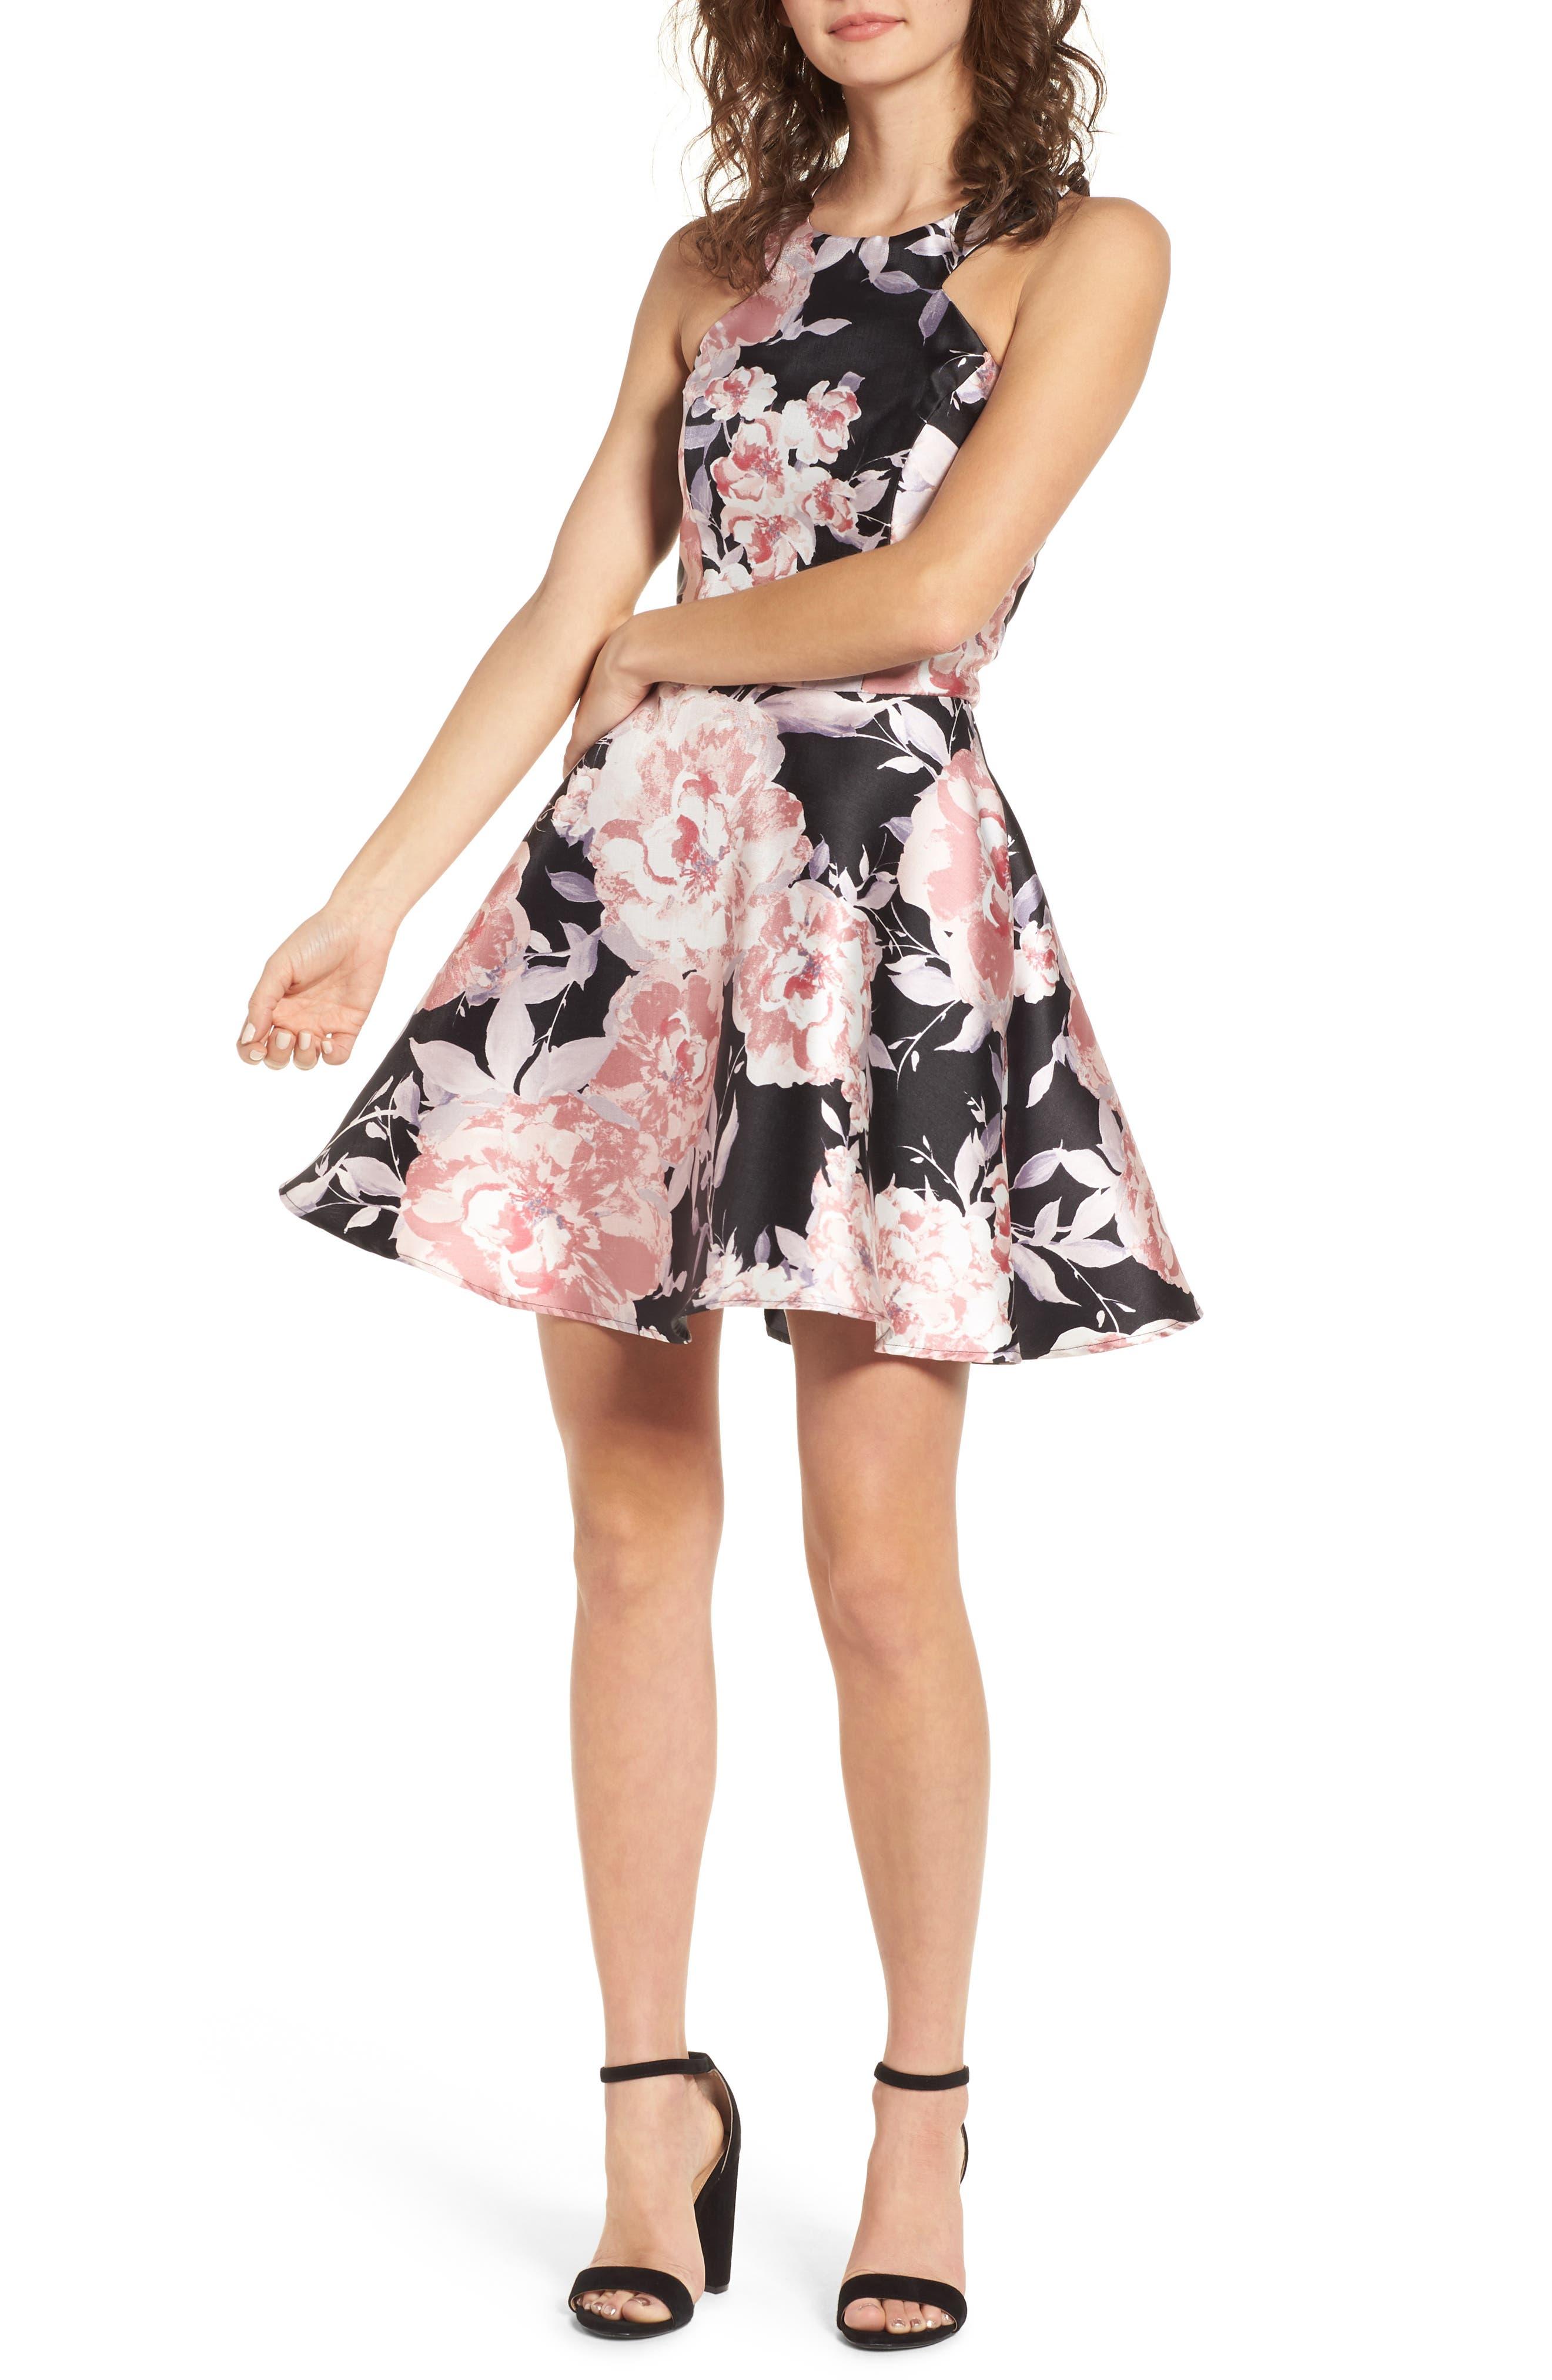 Mikado Skater Dress,                         Main,                         color, Black/ Blush